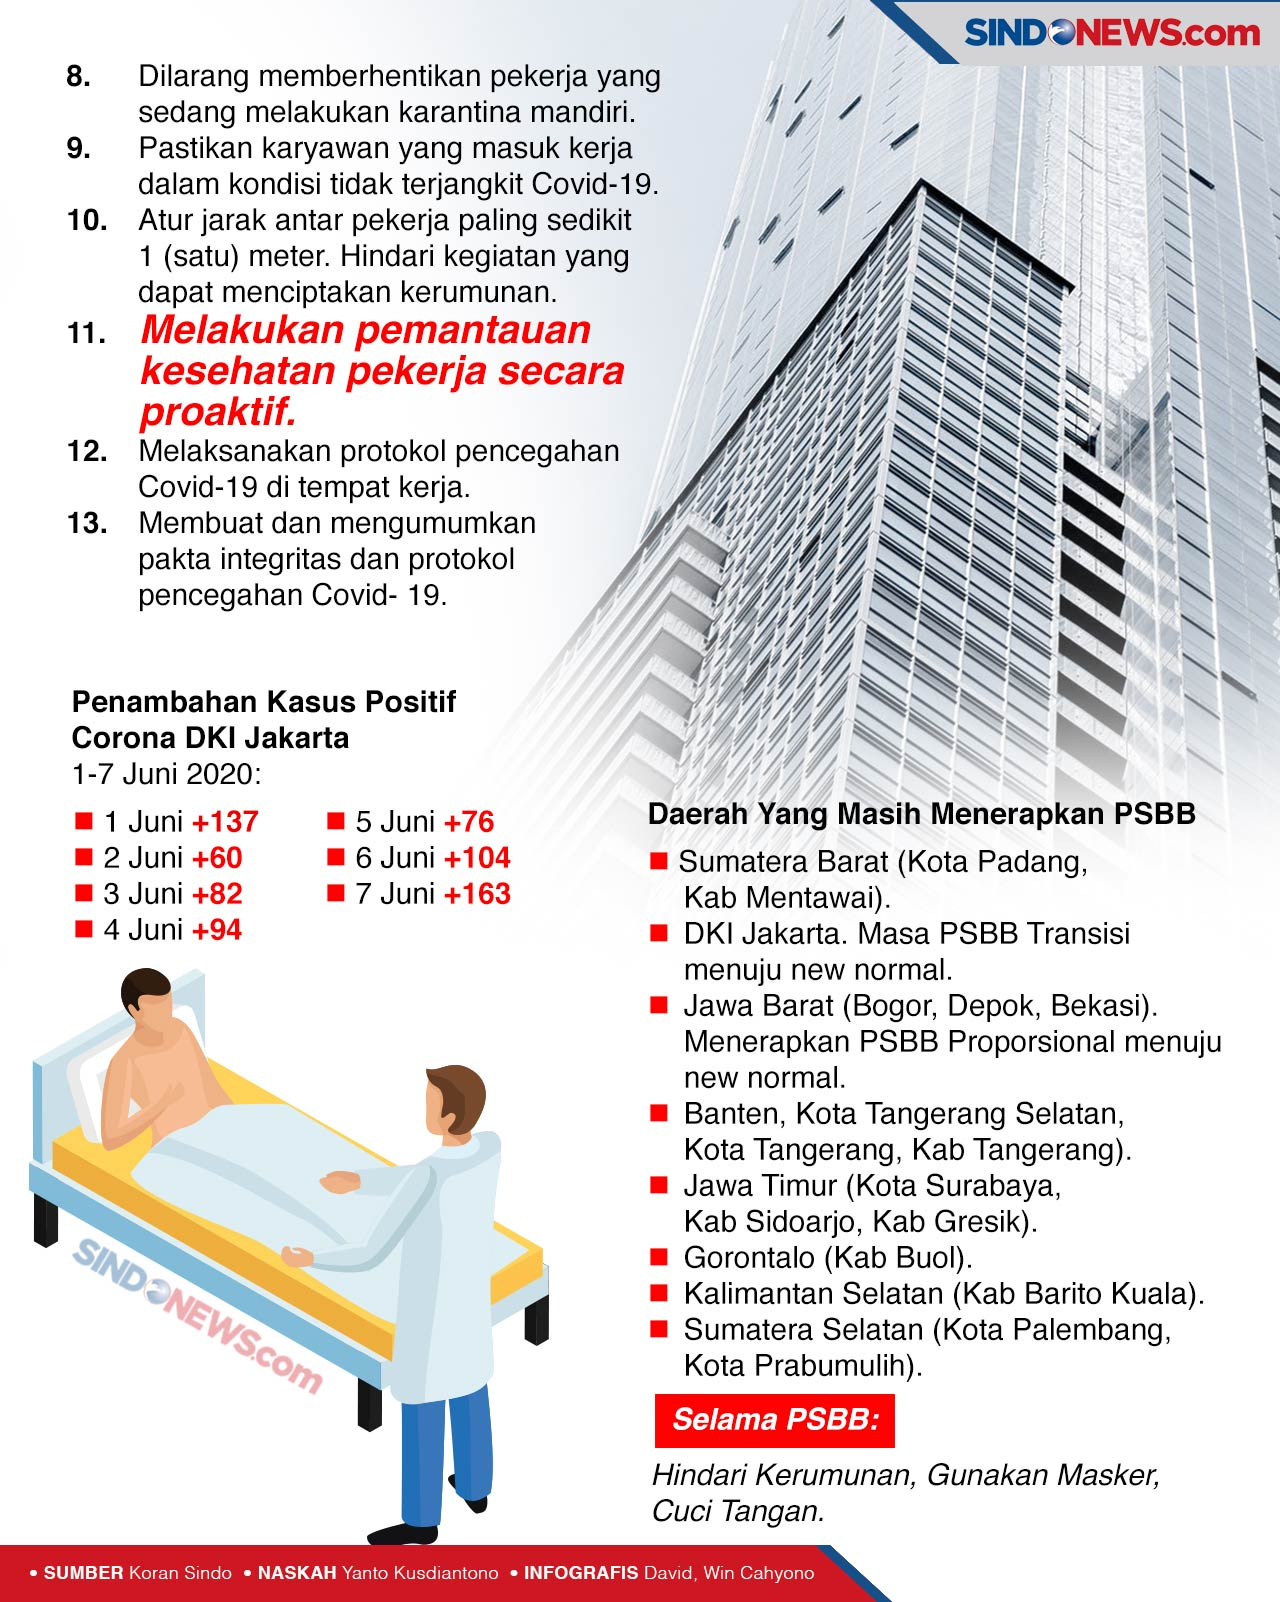 Karyawan Perkantoran Di Dki Jakarta Siap Bekerja Ala Ninja